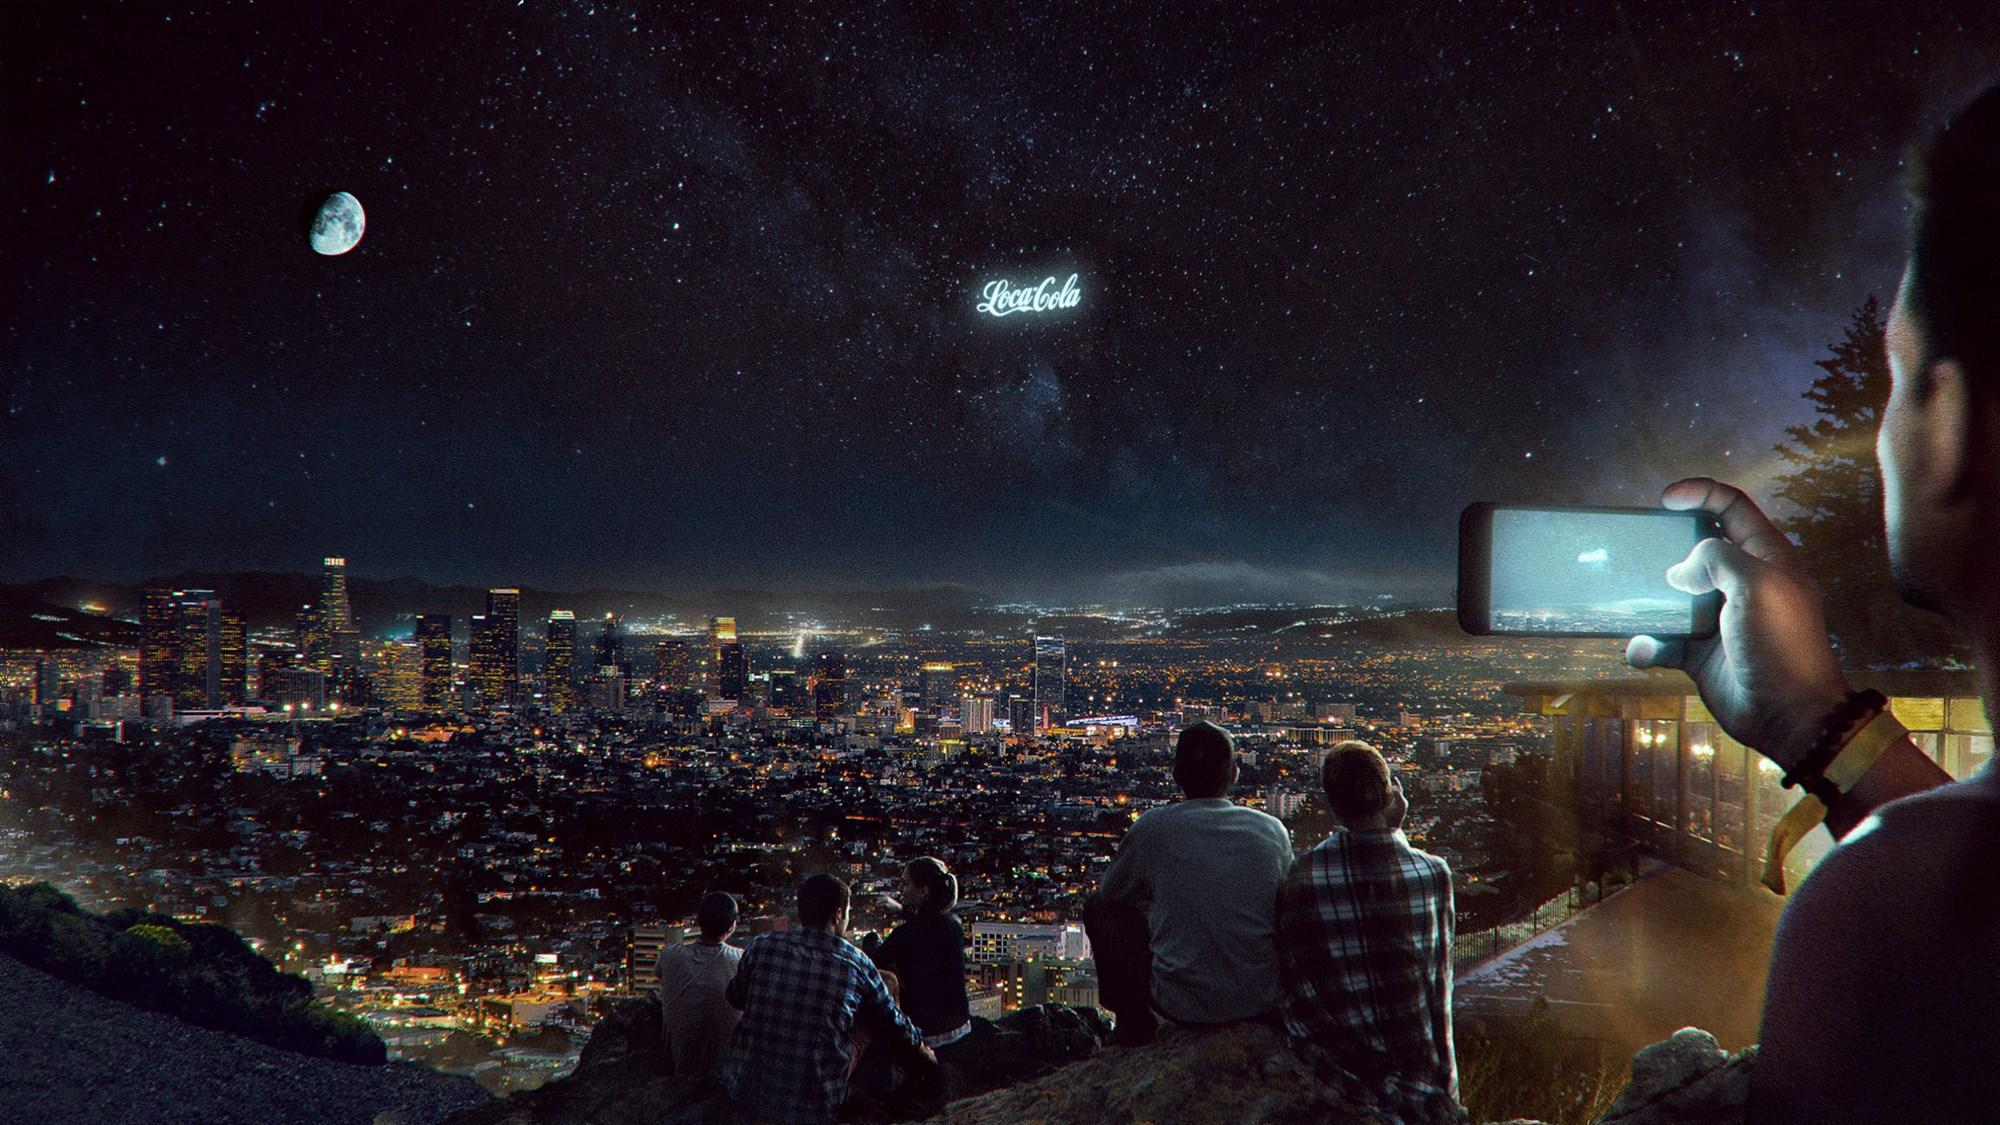 Space billboards, like something from Futurama